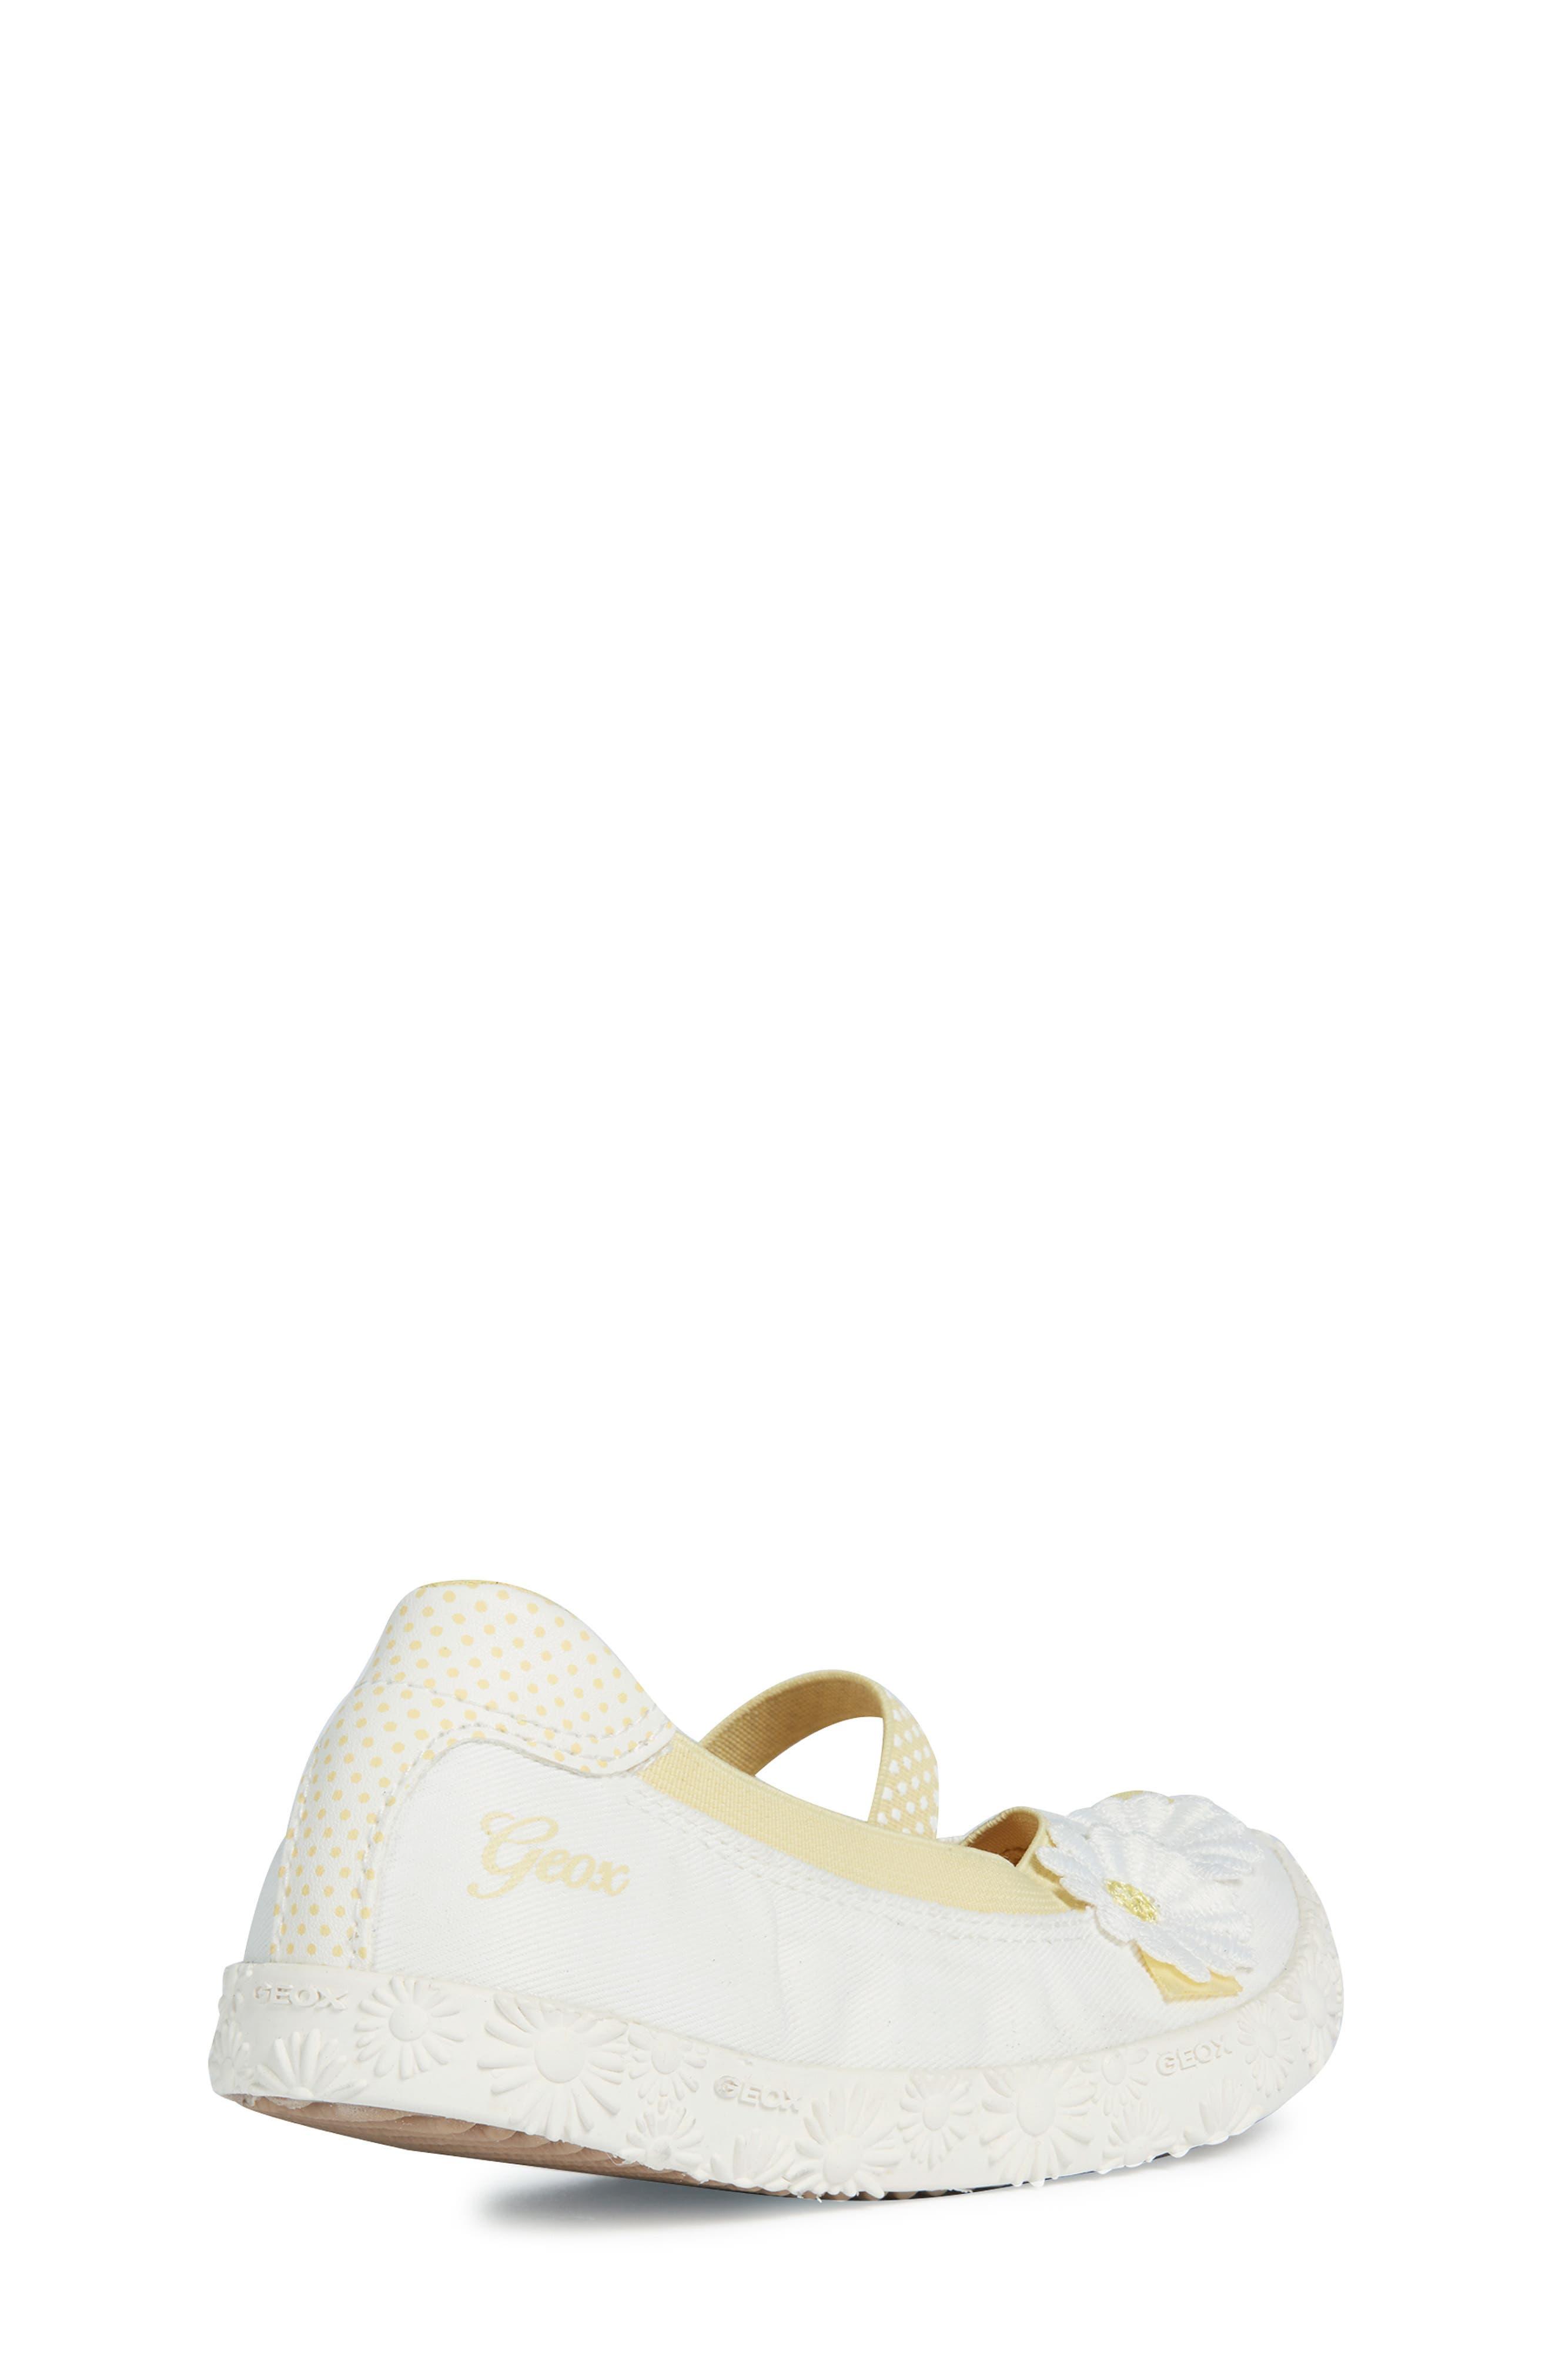 GEOX, Kilwi Daisy Mary Jane Sneaker, Alternate thumbnail 7, color, WHITE